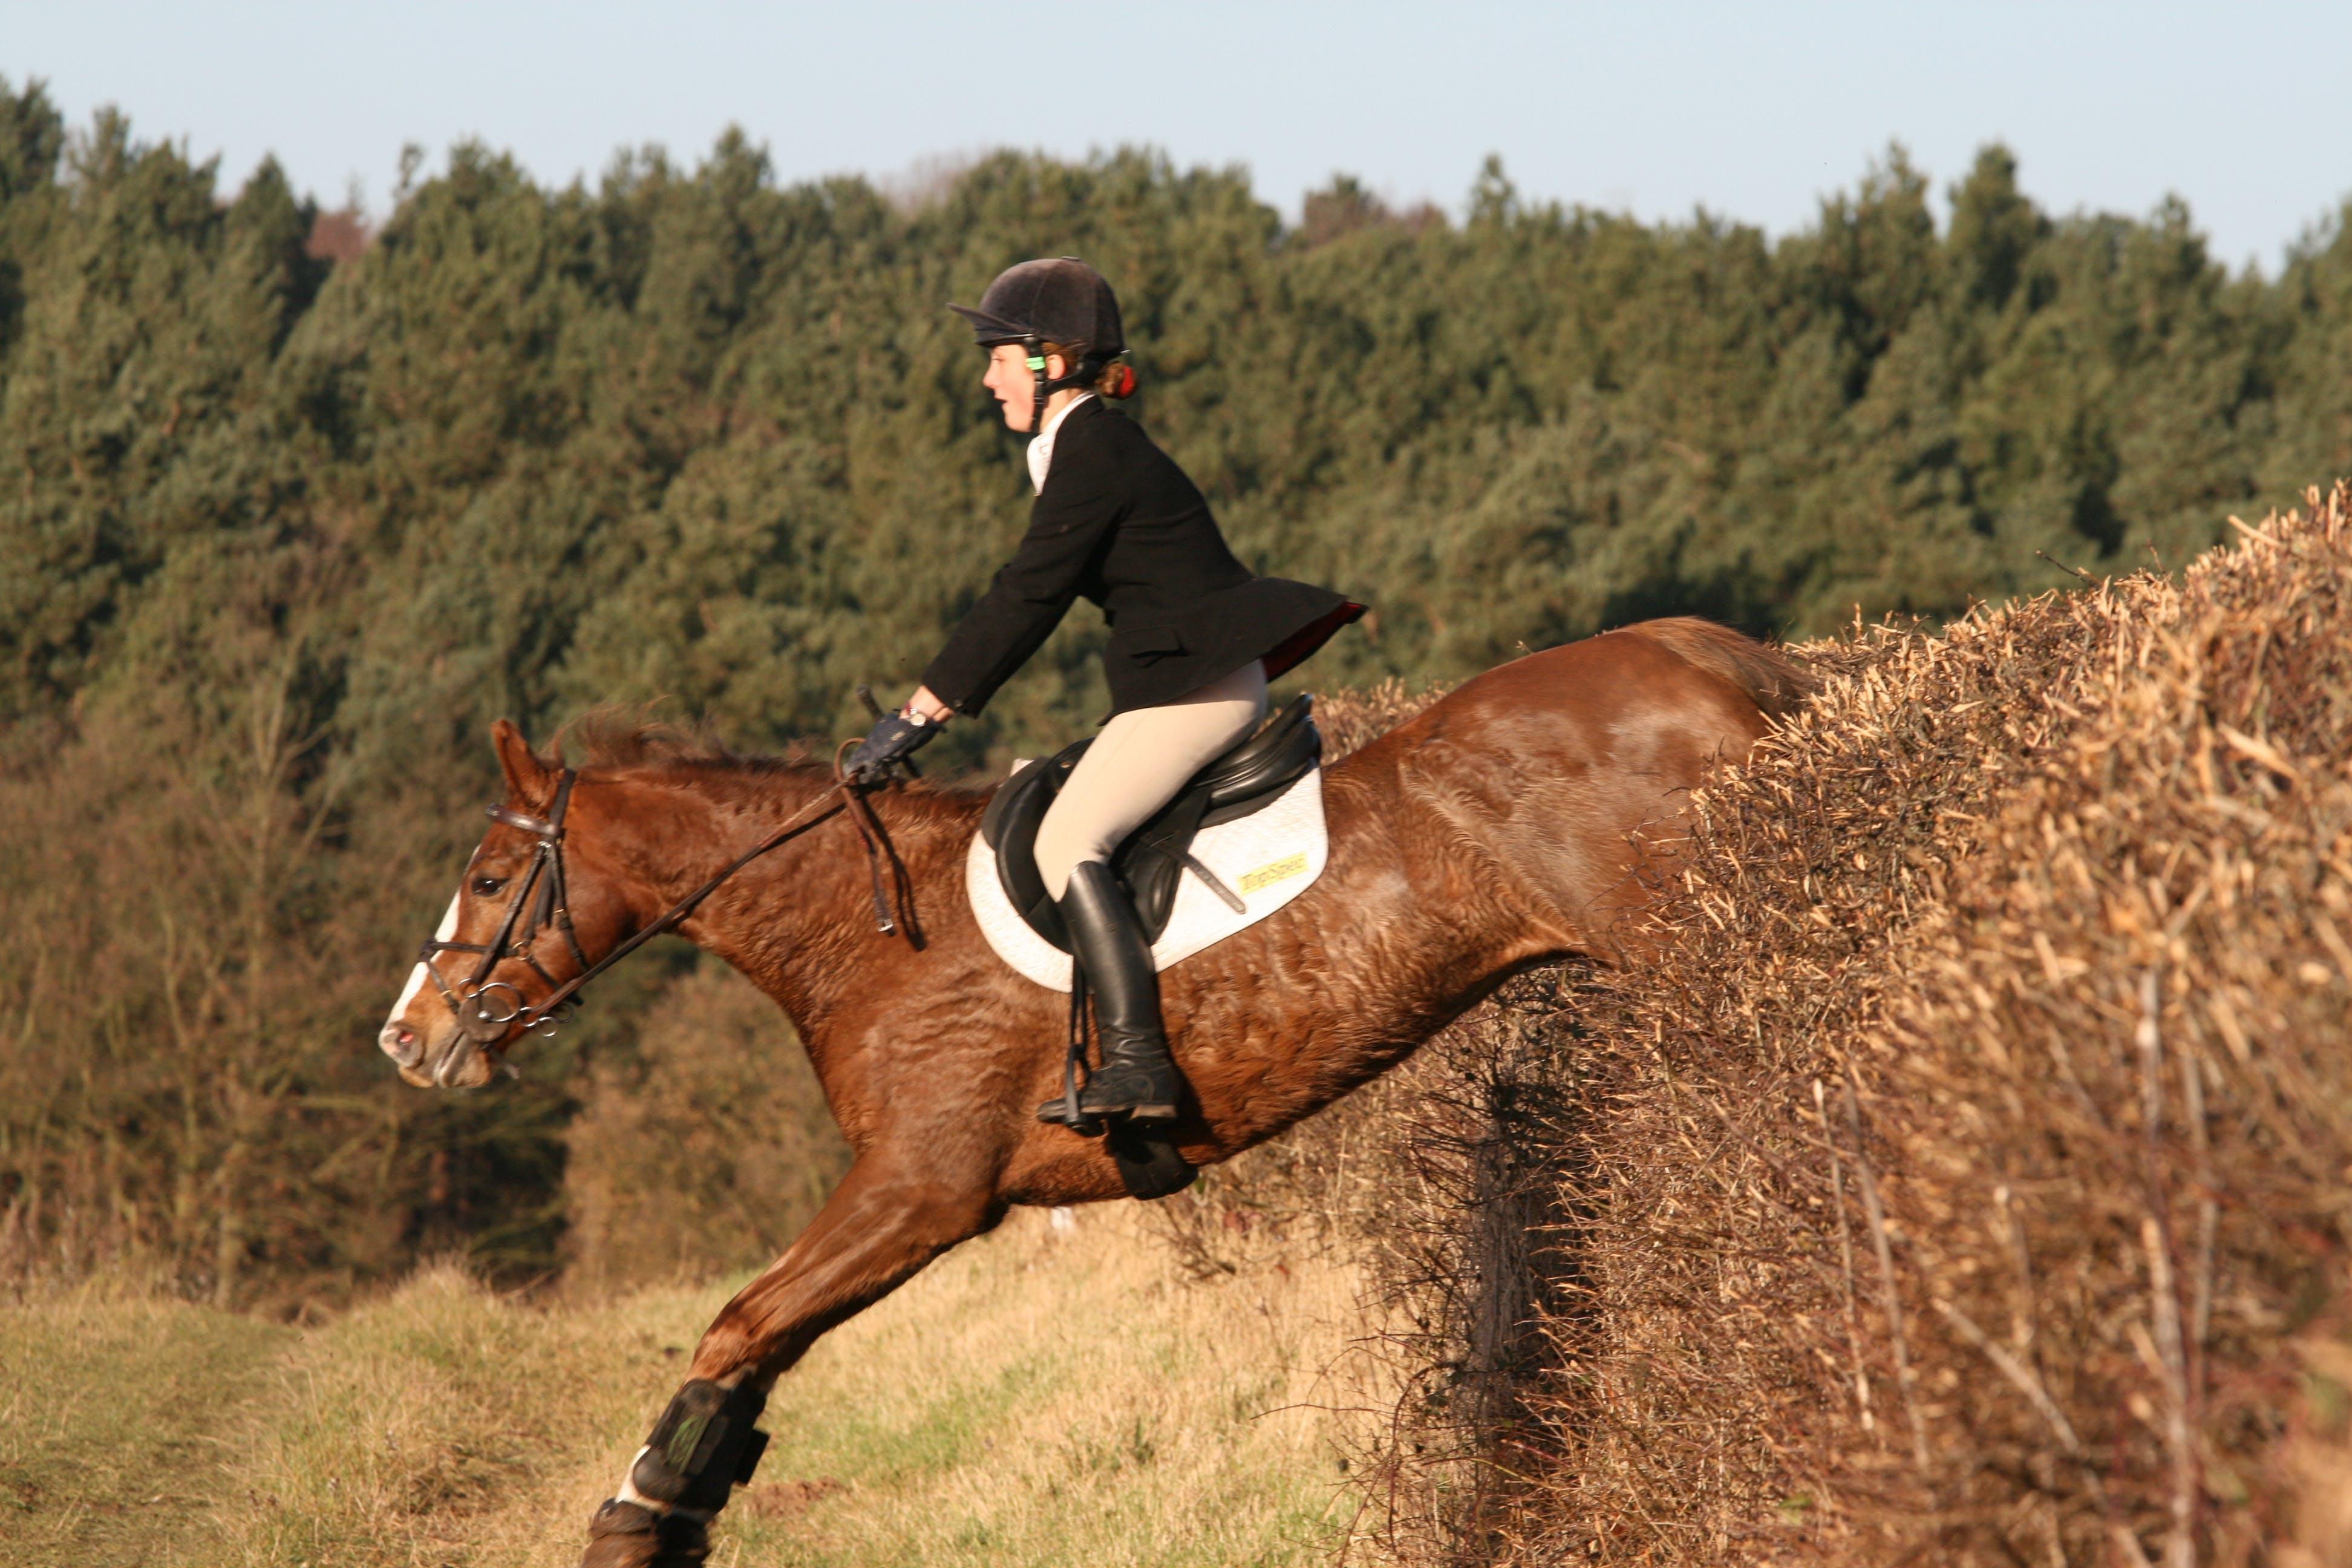 horse, horse rider, horseback riding